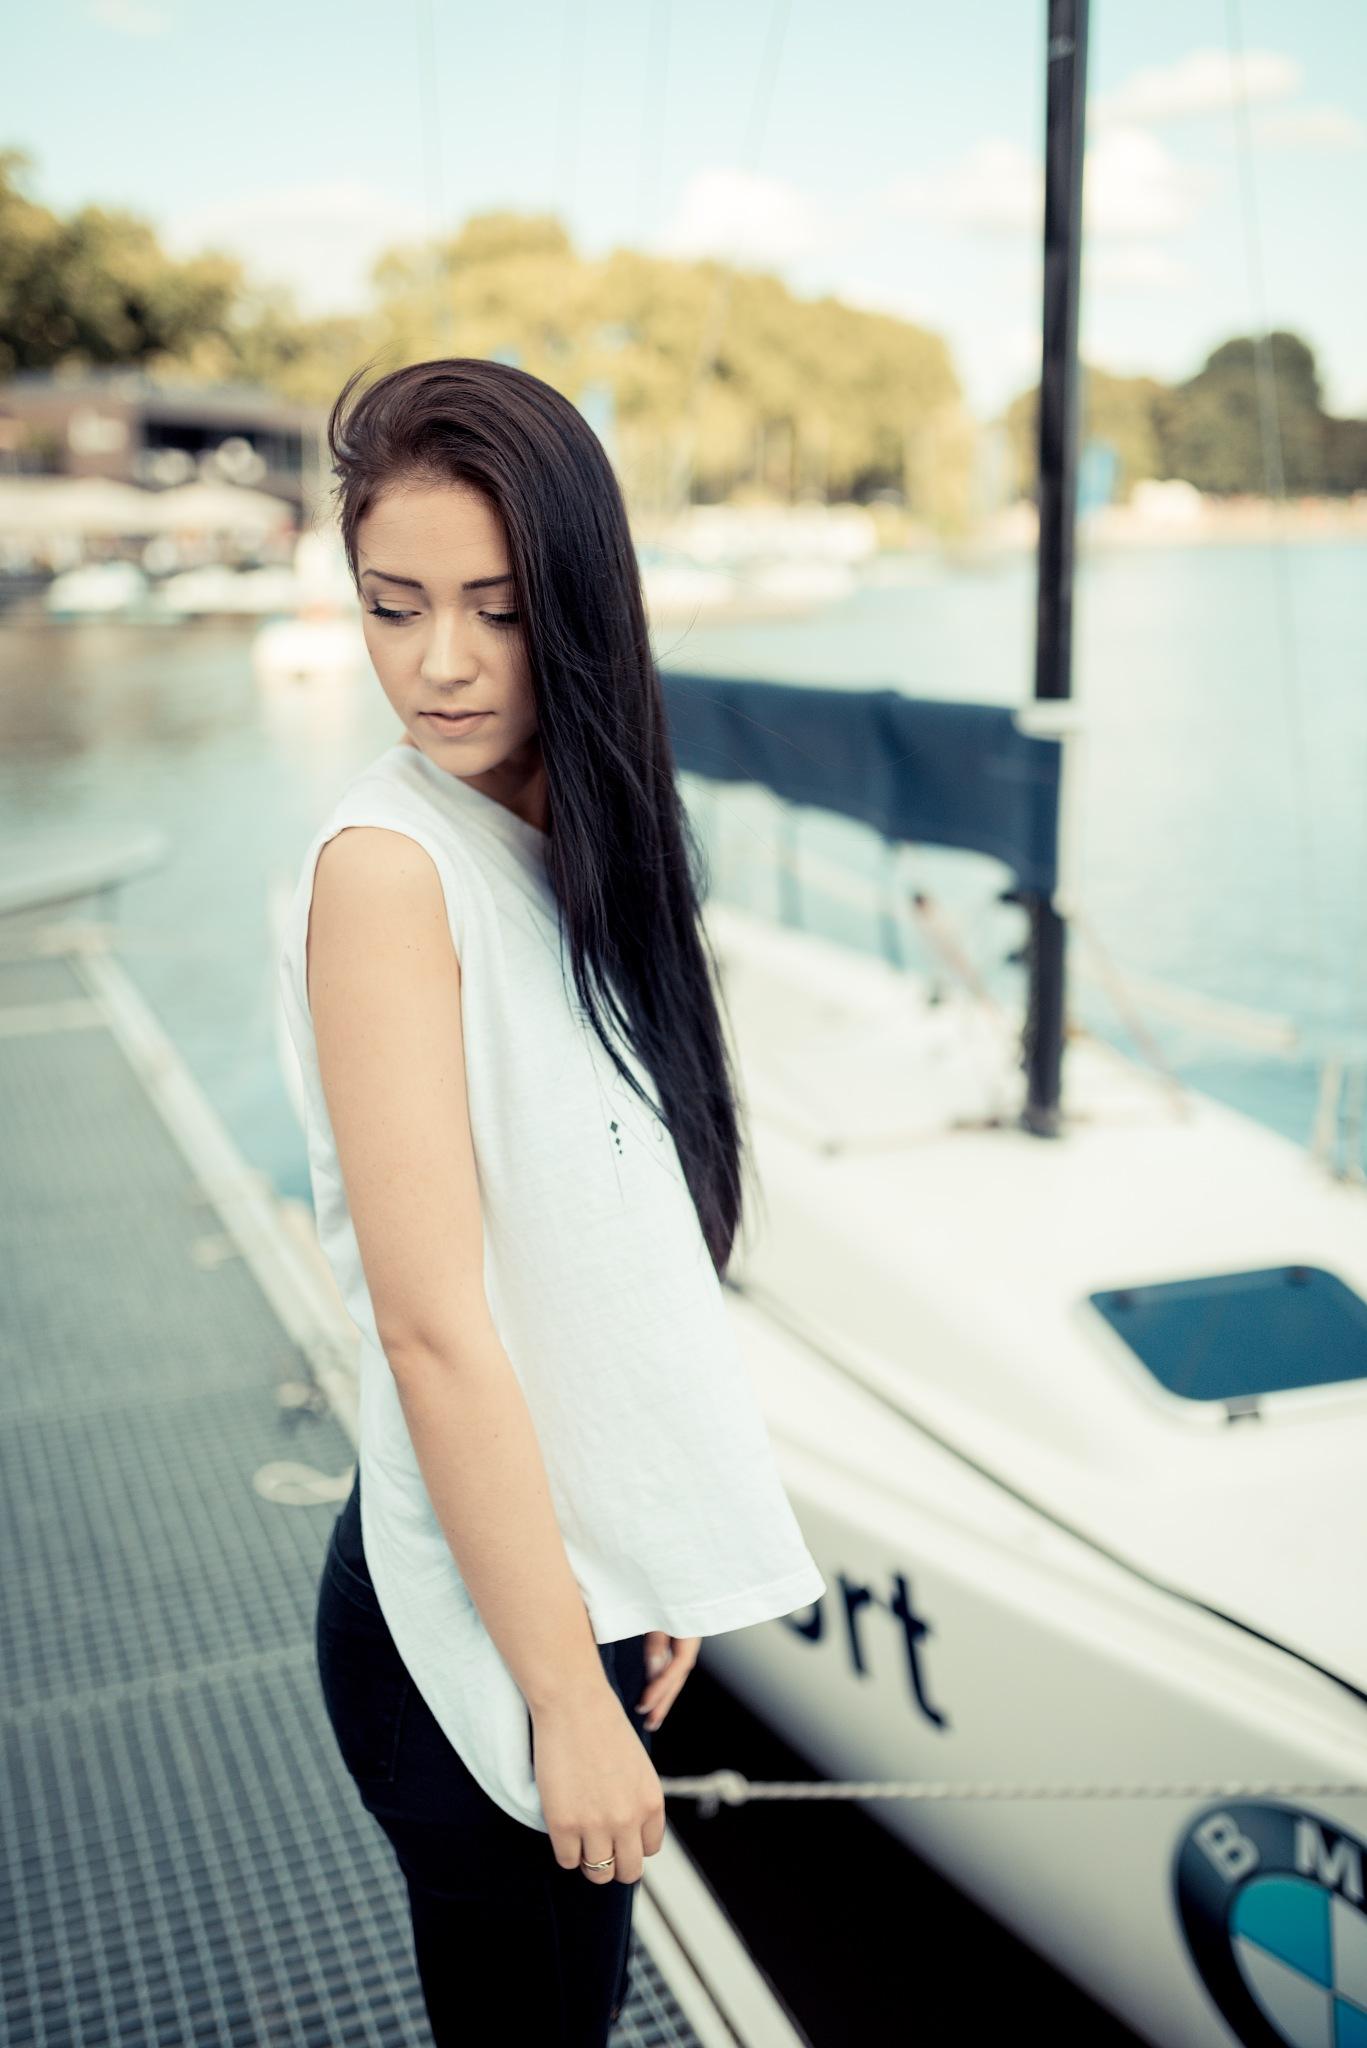 Silvi, at the boardwalk by Pixelhunter